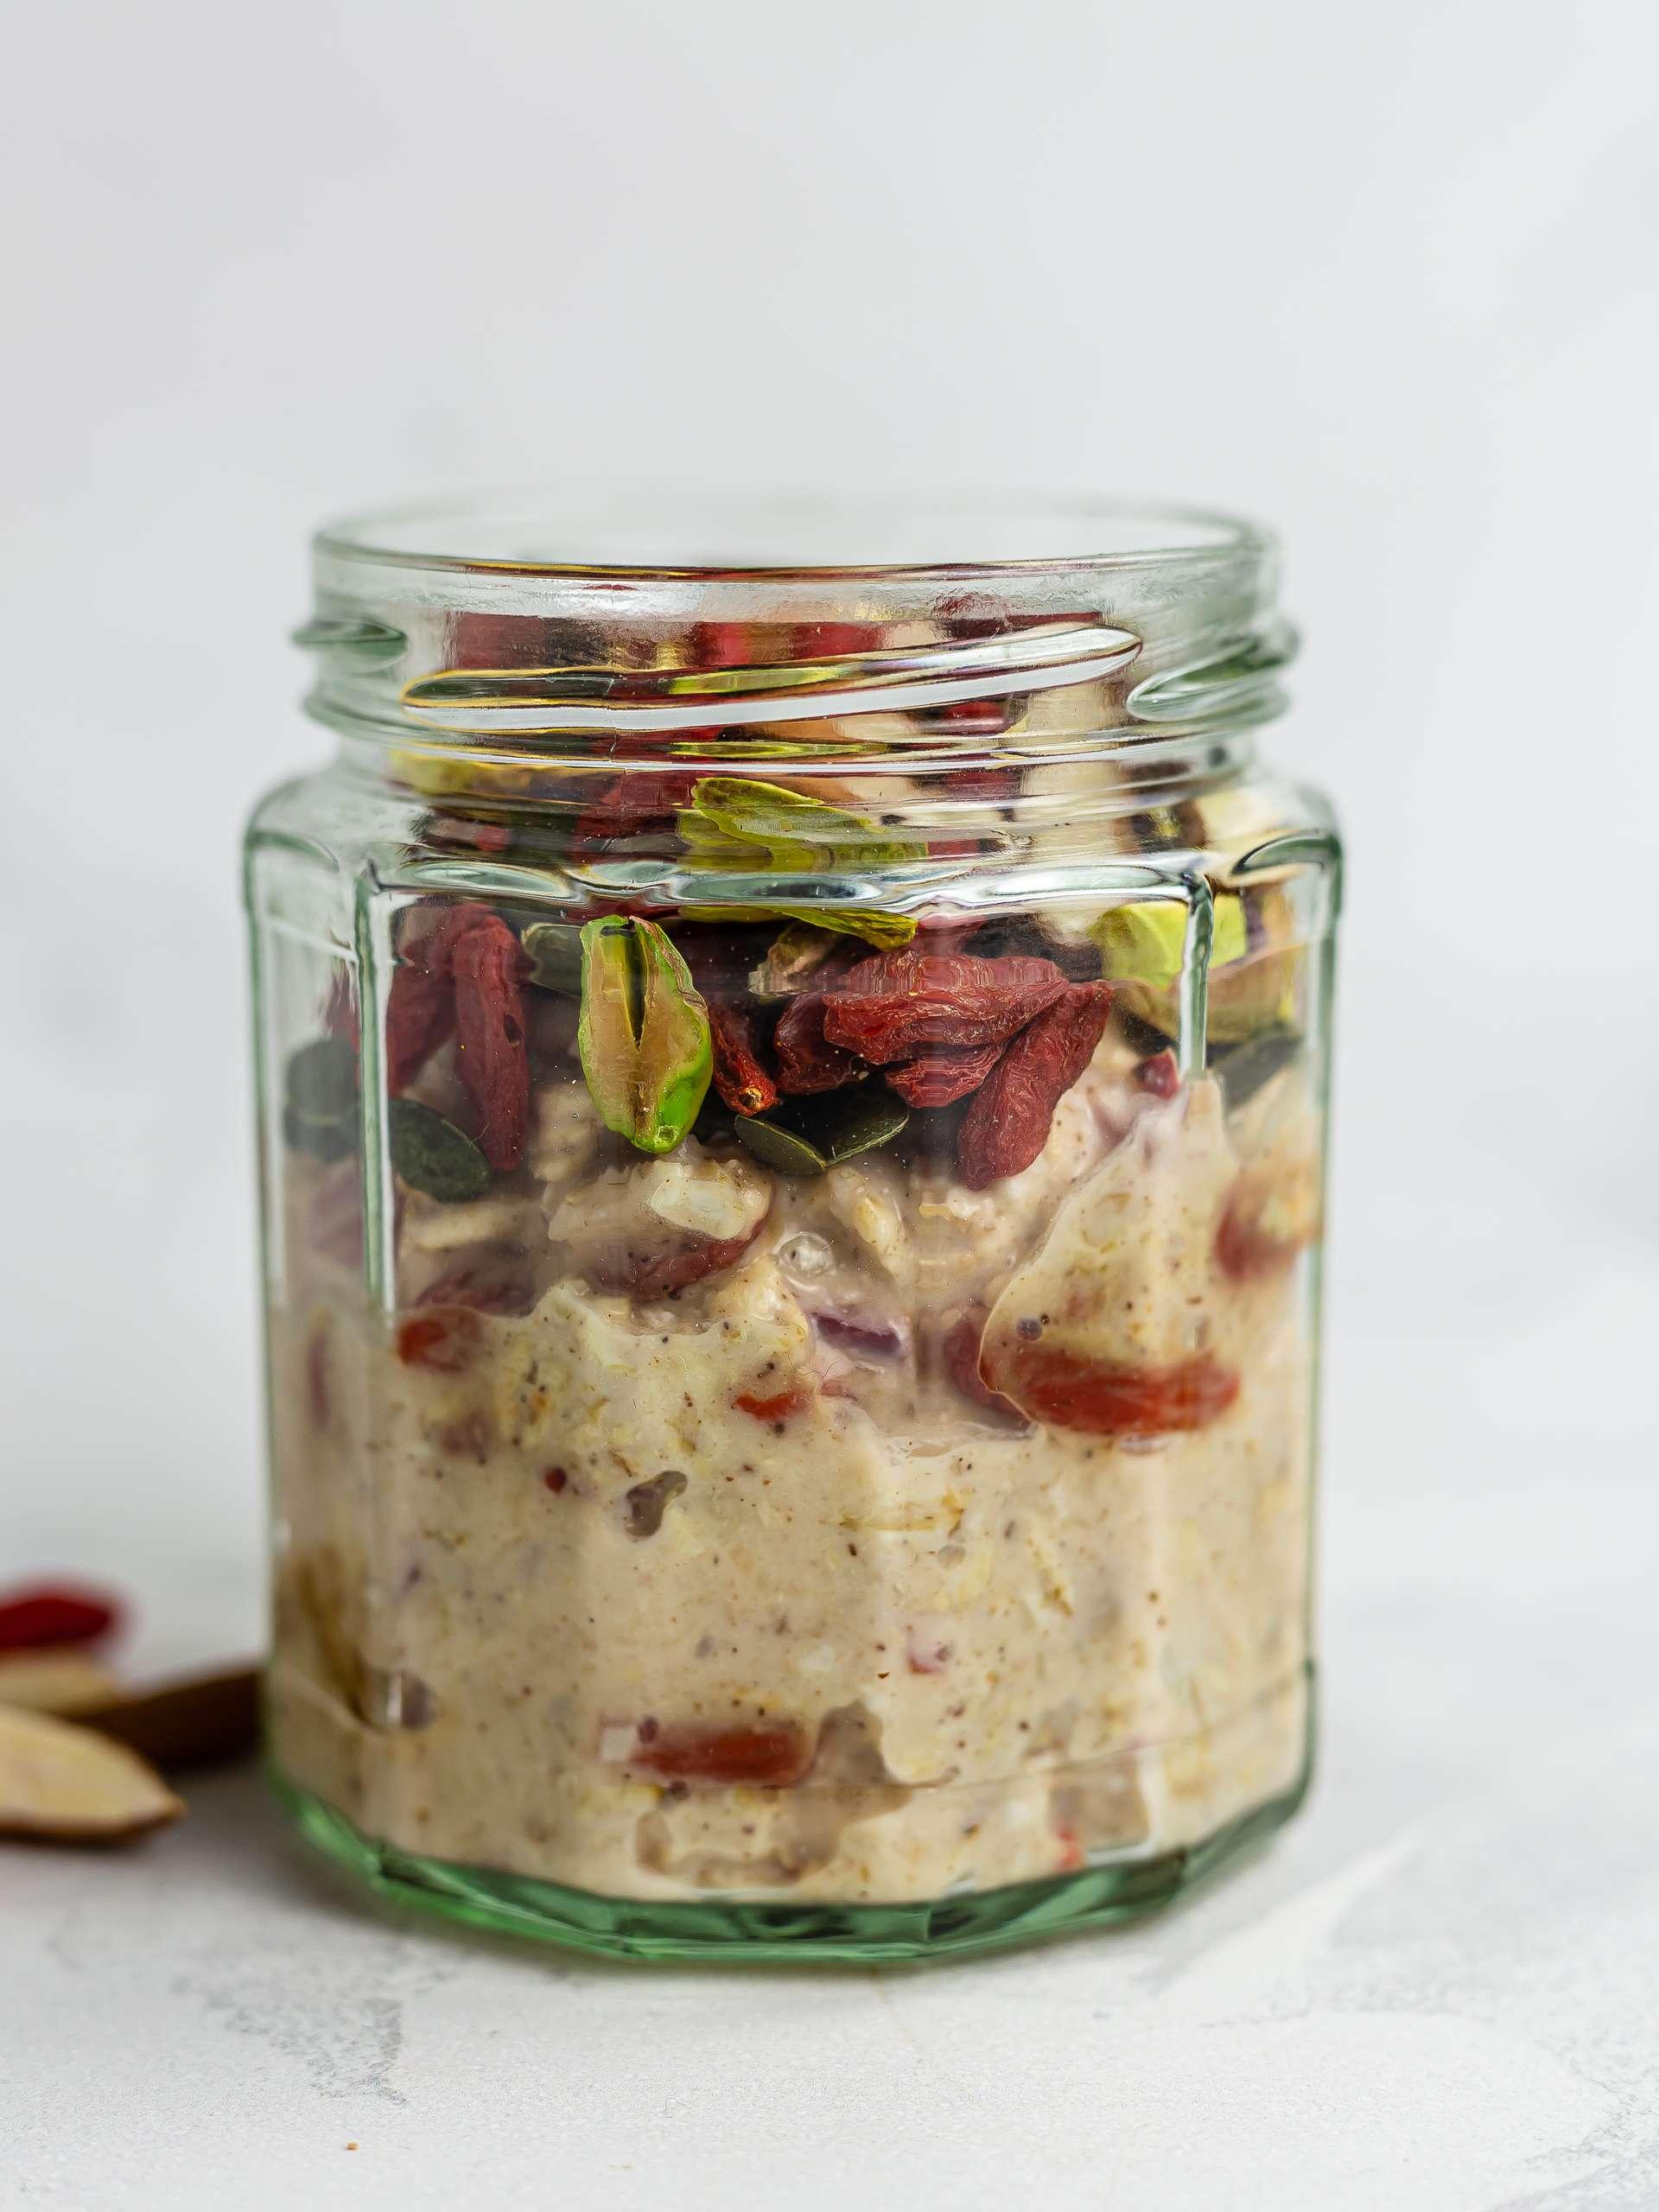 pistachios, almond, and pumpkin seeds with bircher muesli in a jar